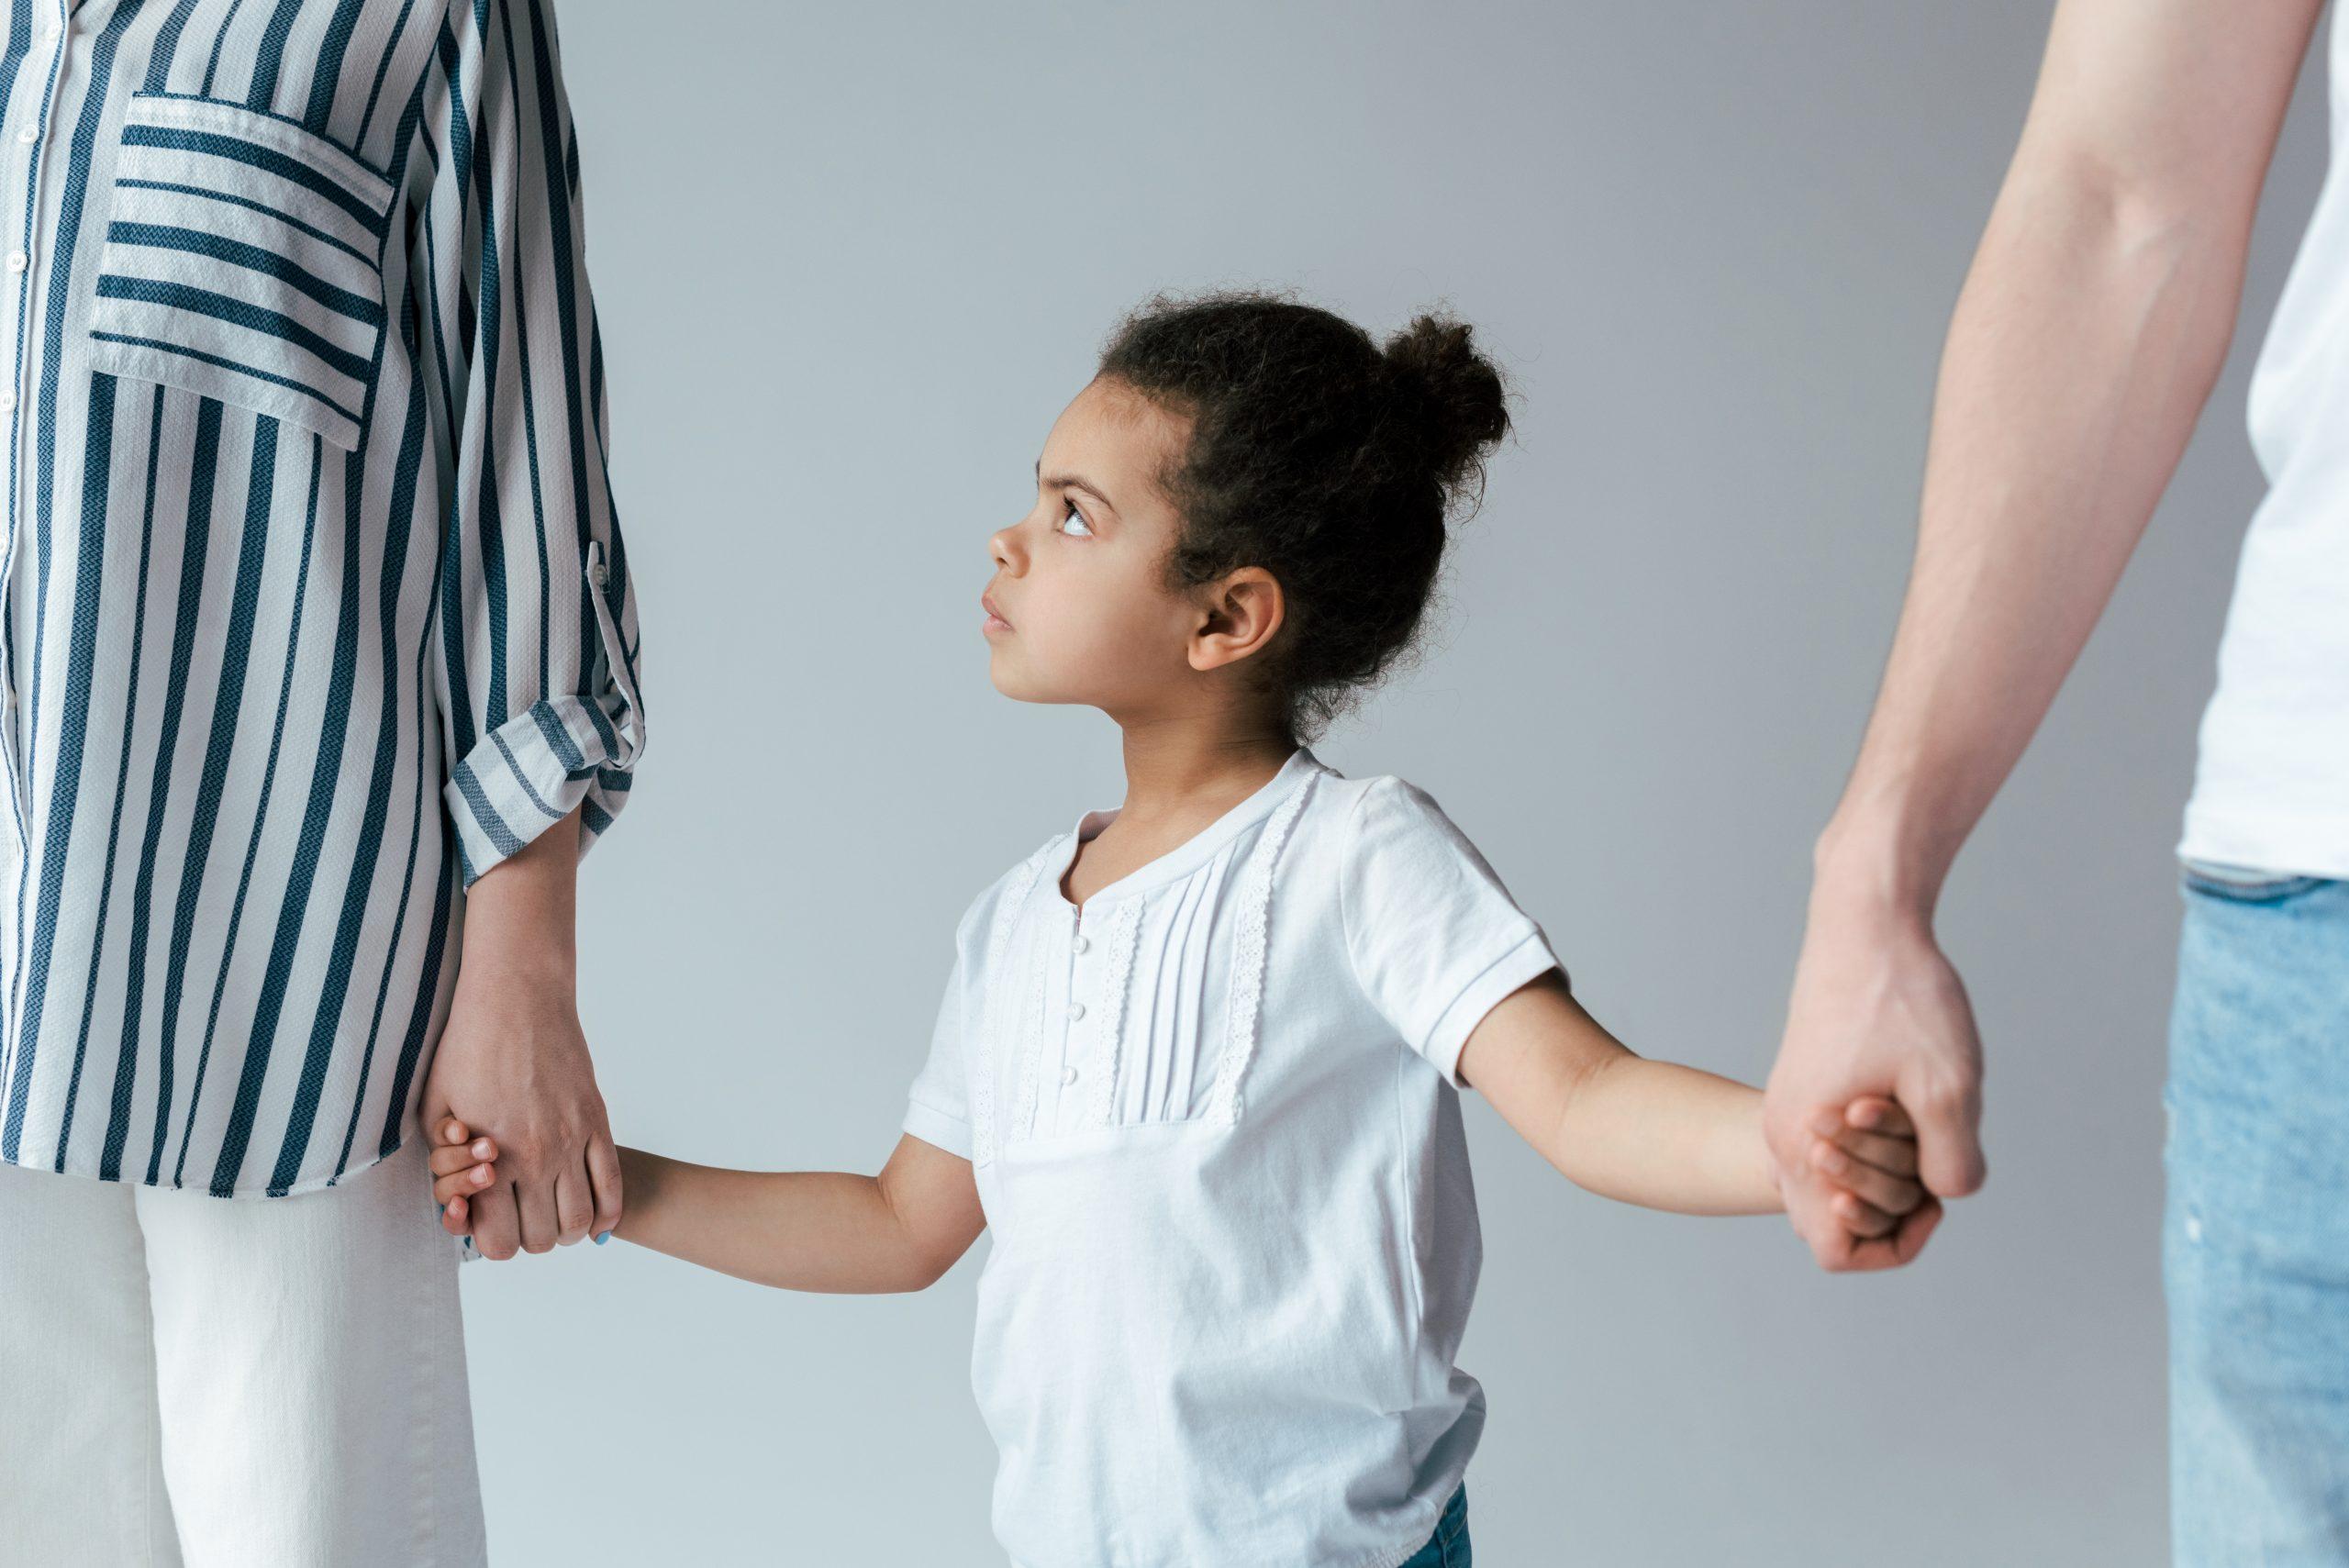 Child-Custody-lawyer-riverside-family-attorney-inland-empire-skilled-